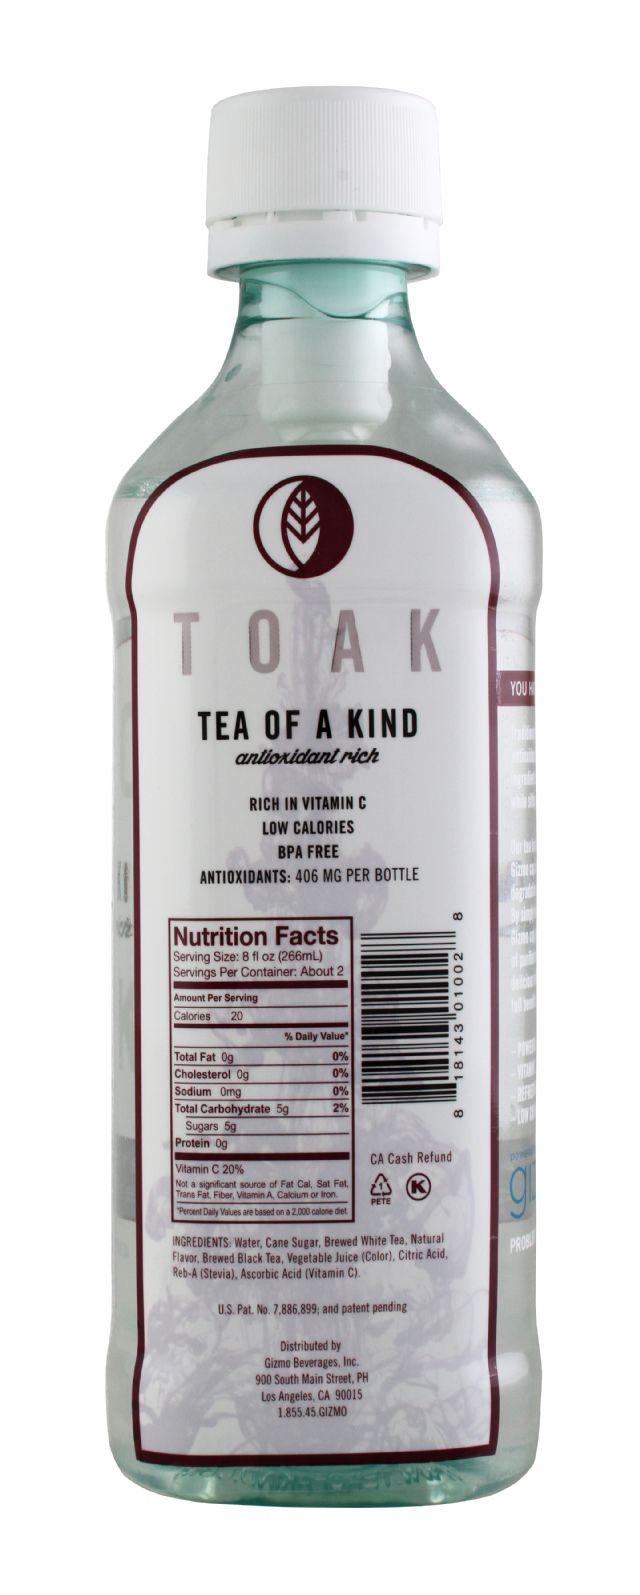 Tea of a Kind: TeaKind PomAcai Facts